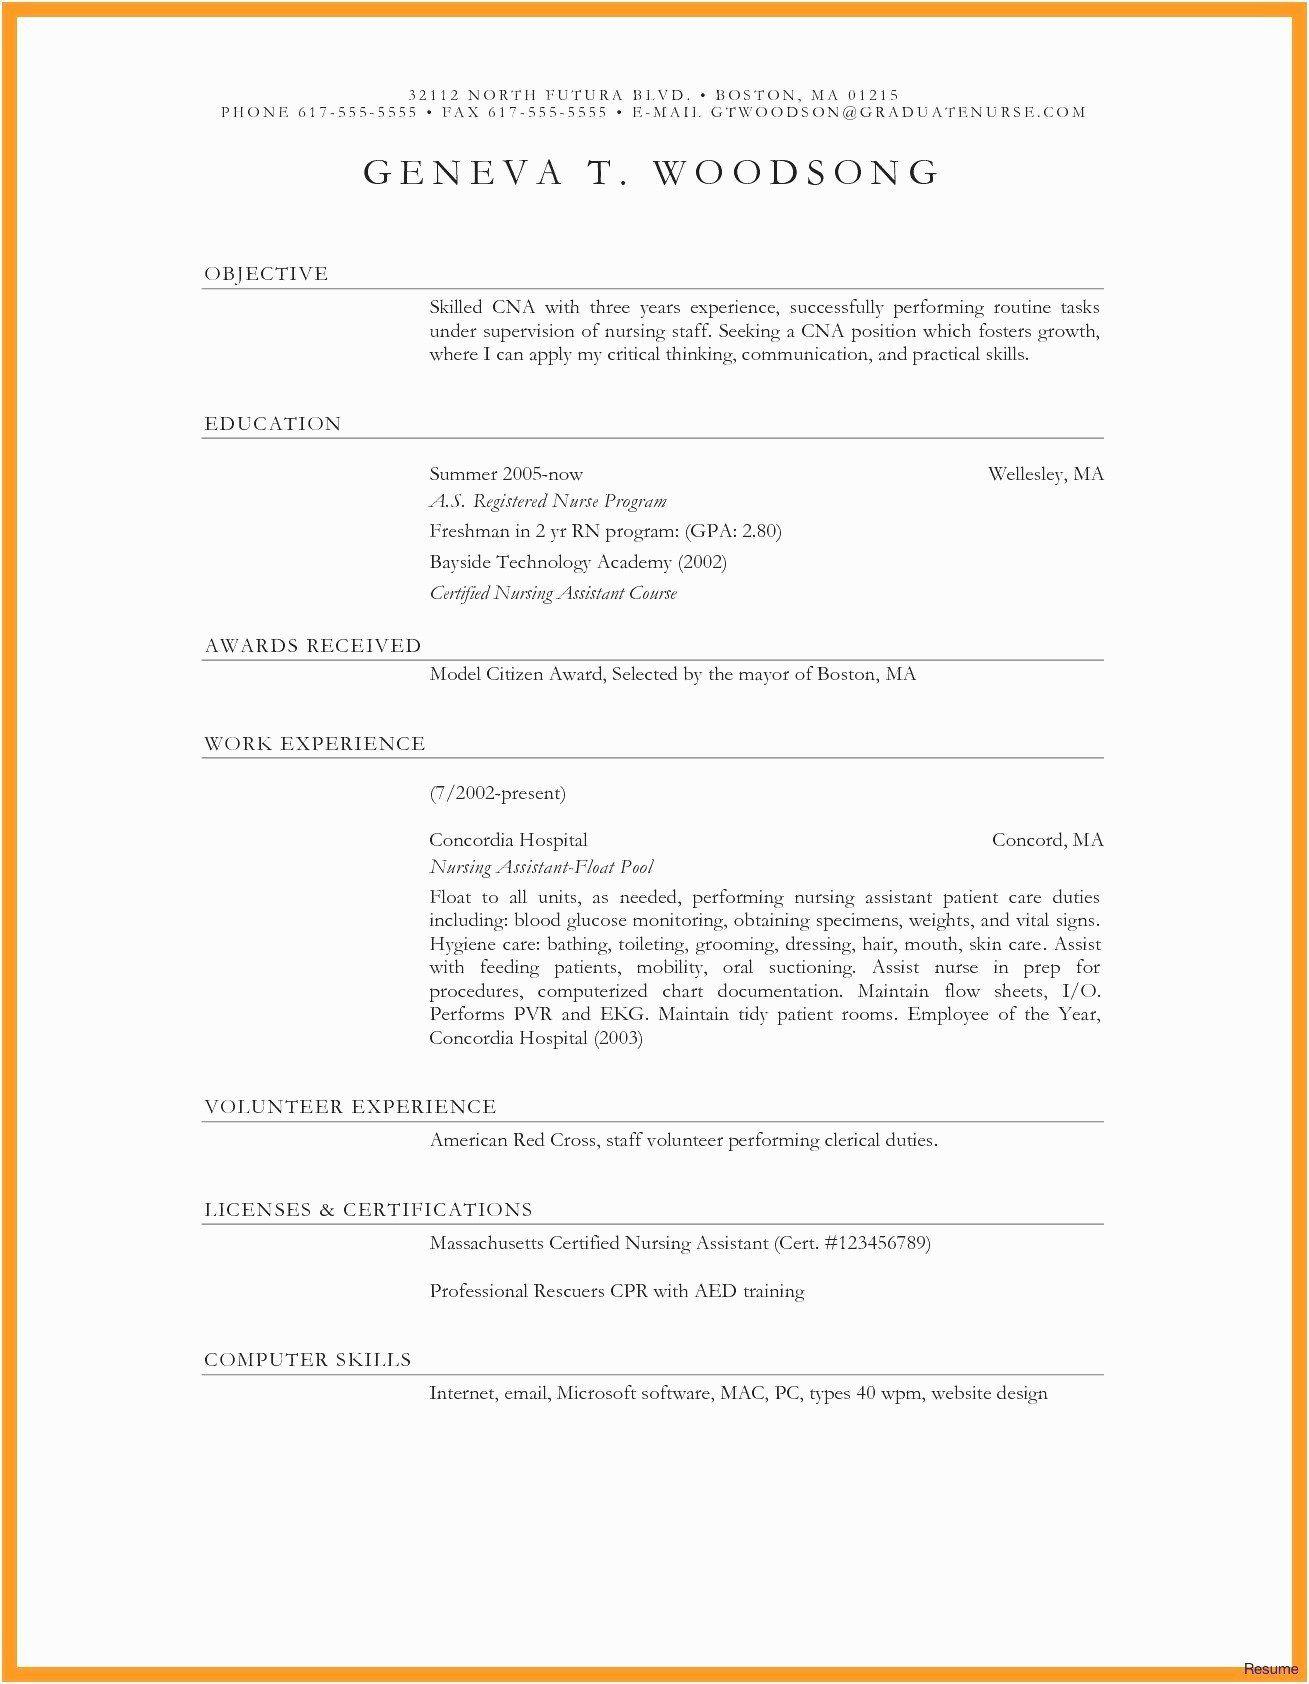 Social Media Resume Example Luxury 35 Incredible Certificate Participation Sample Resume Examples Unique Resume Teacher Resume